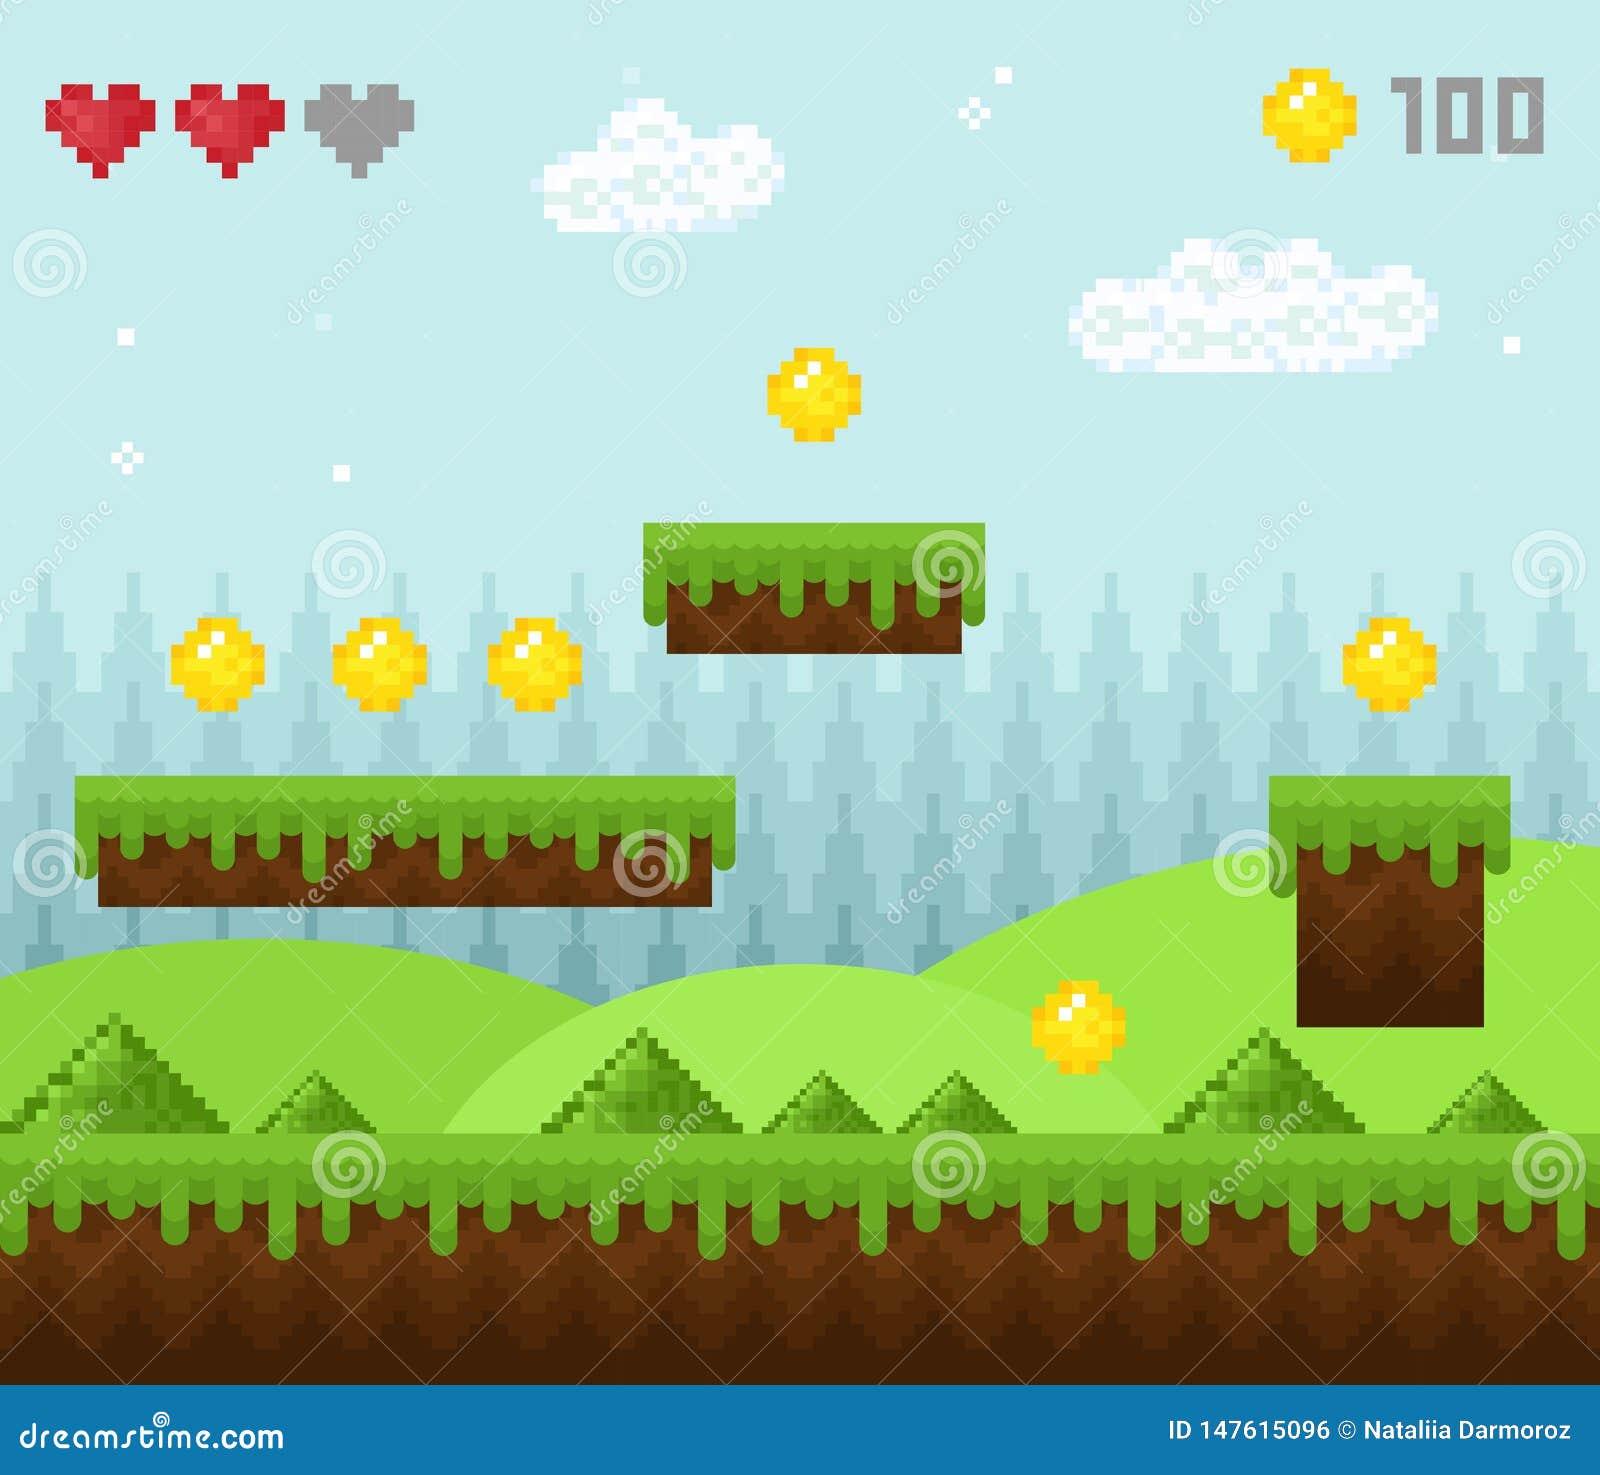 Vector Illustration Of Retro Style Pixel Game Landscape